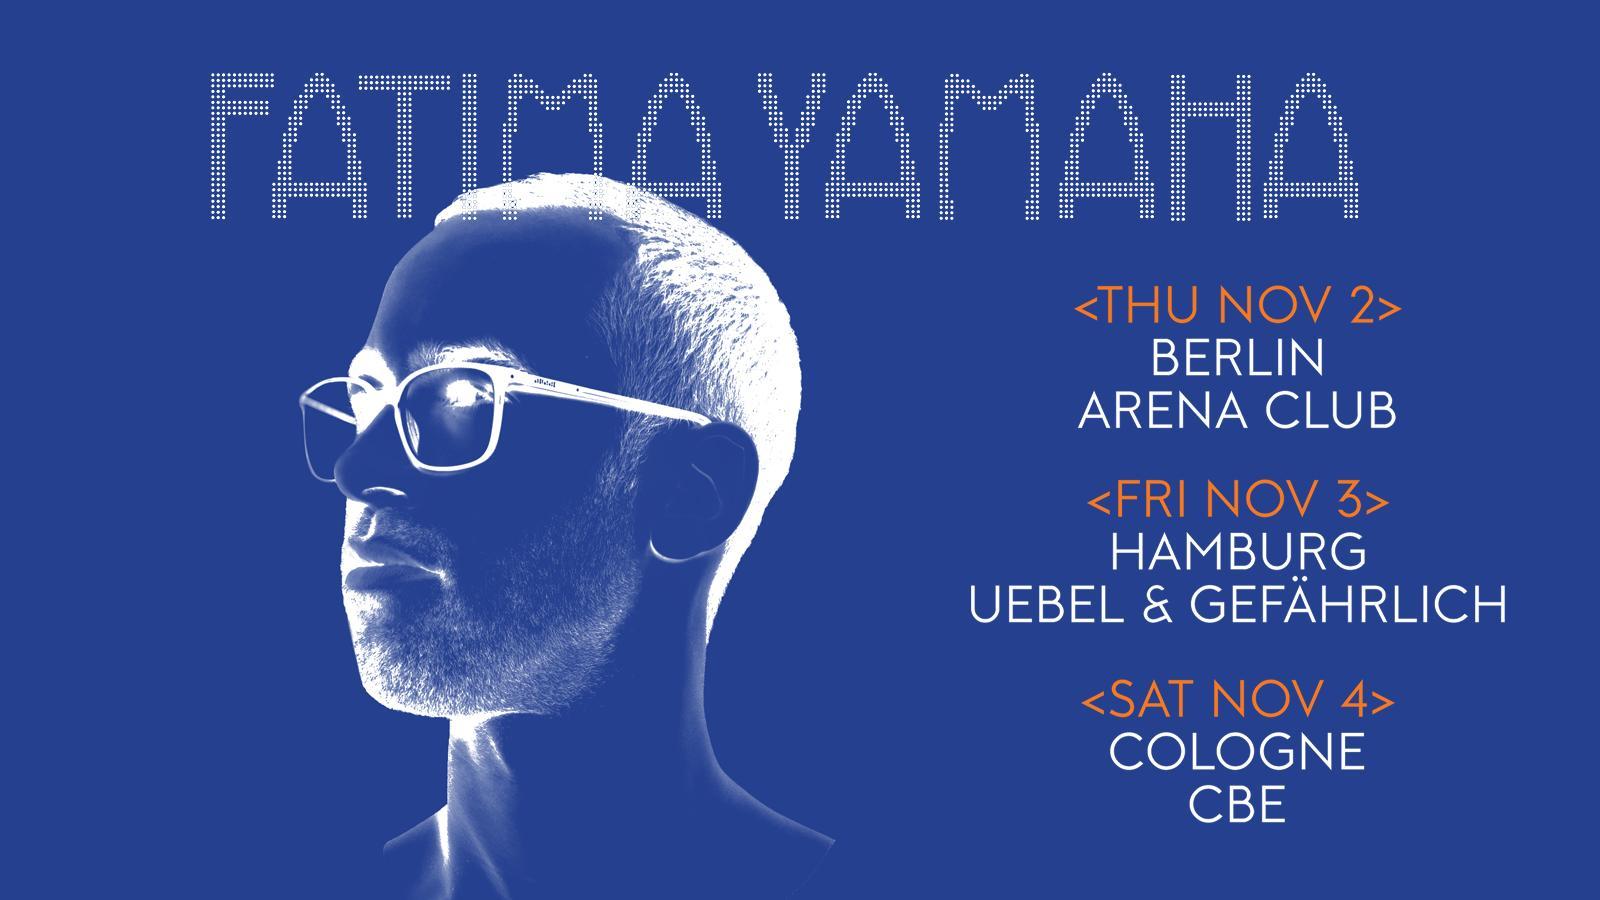 Fatima Yamaha 2017 Tour Lead